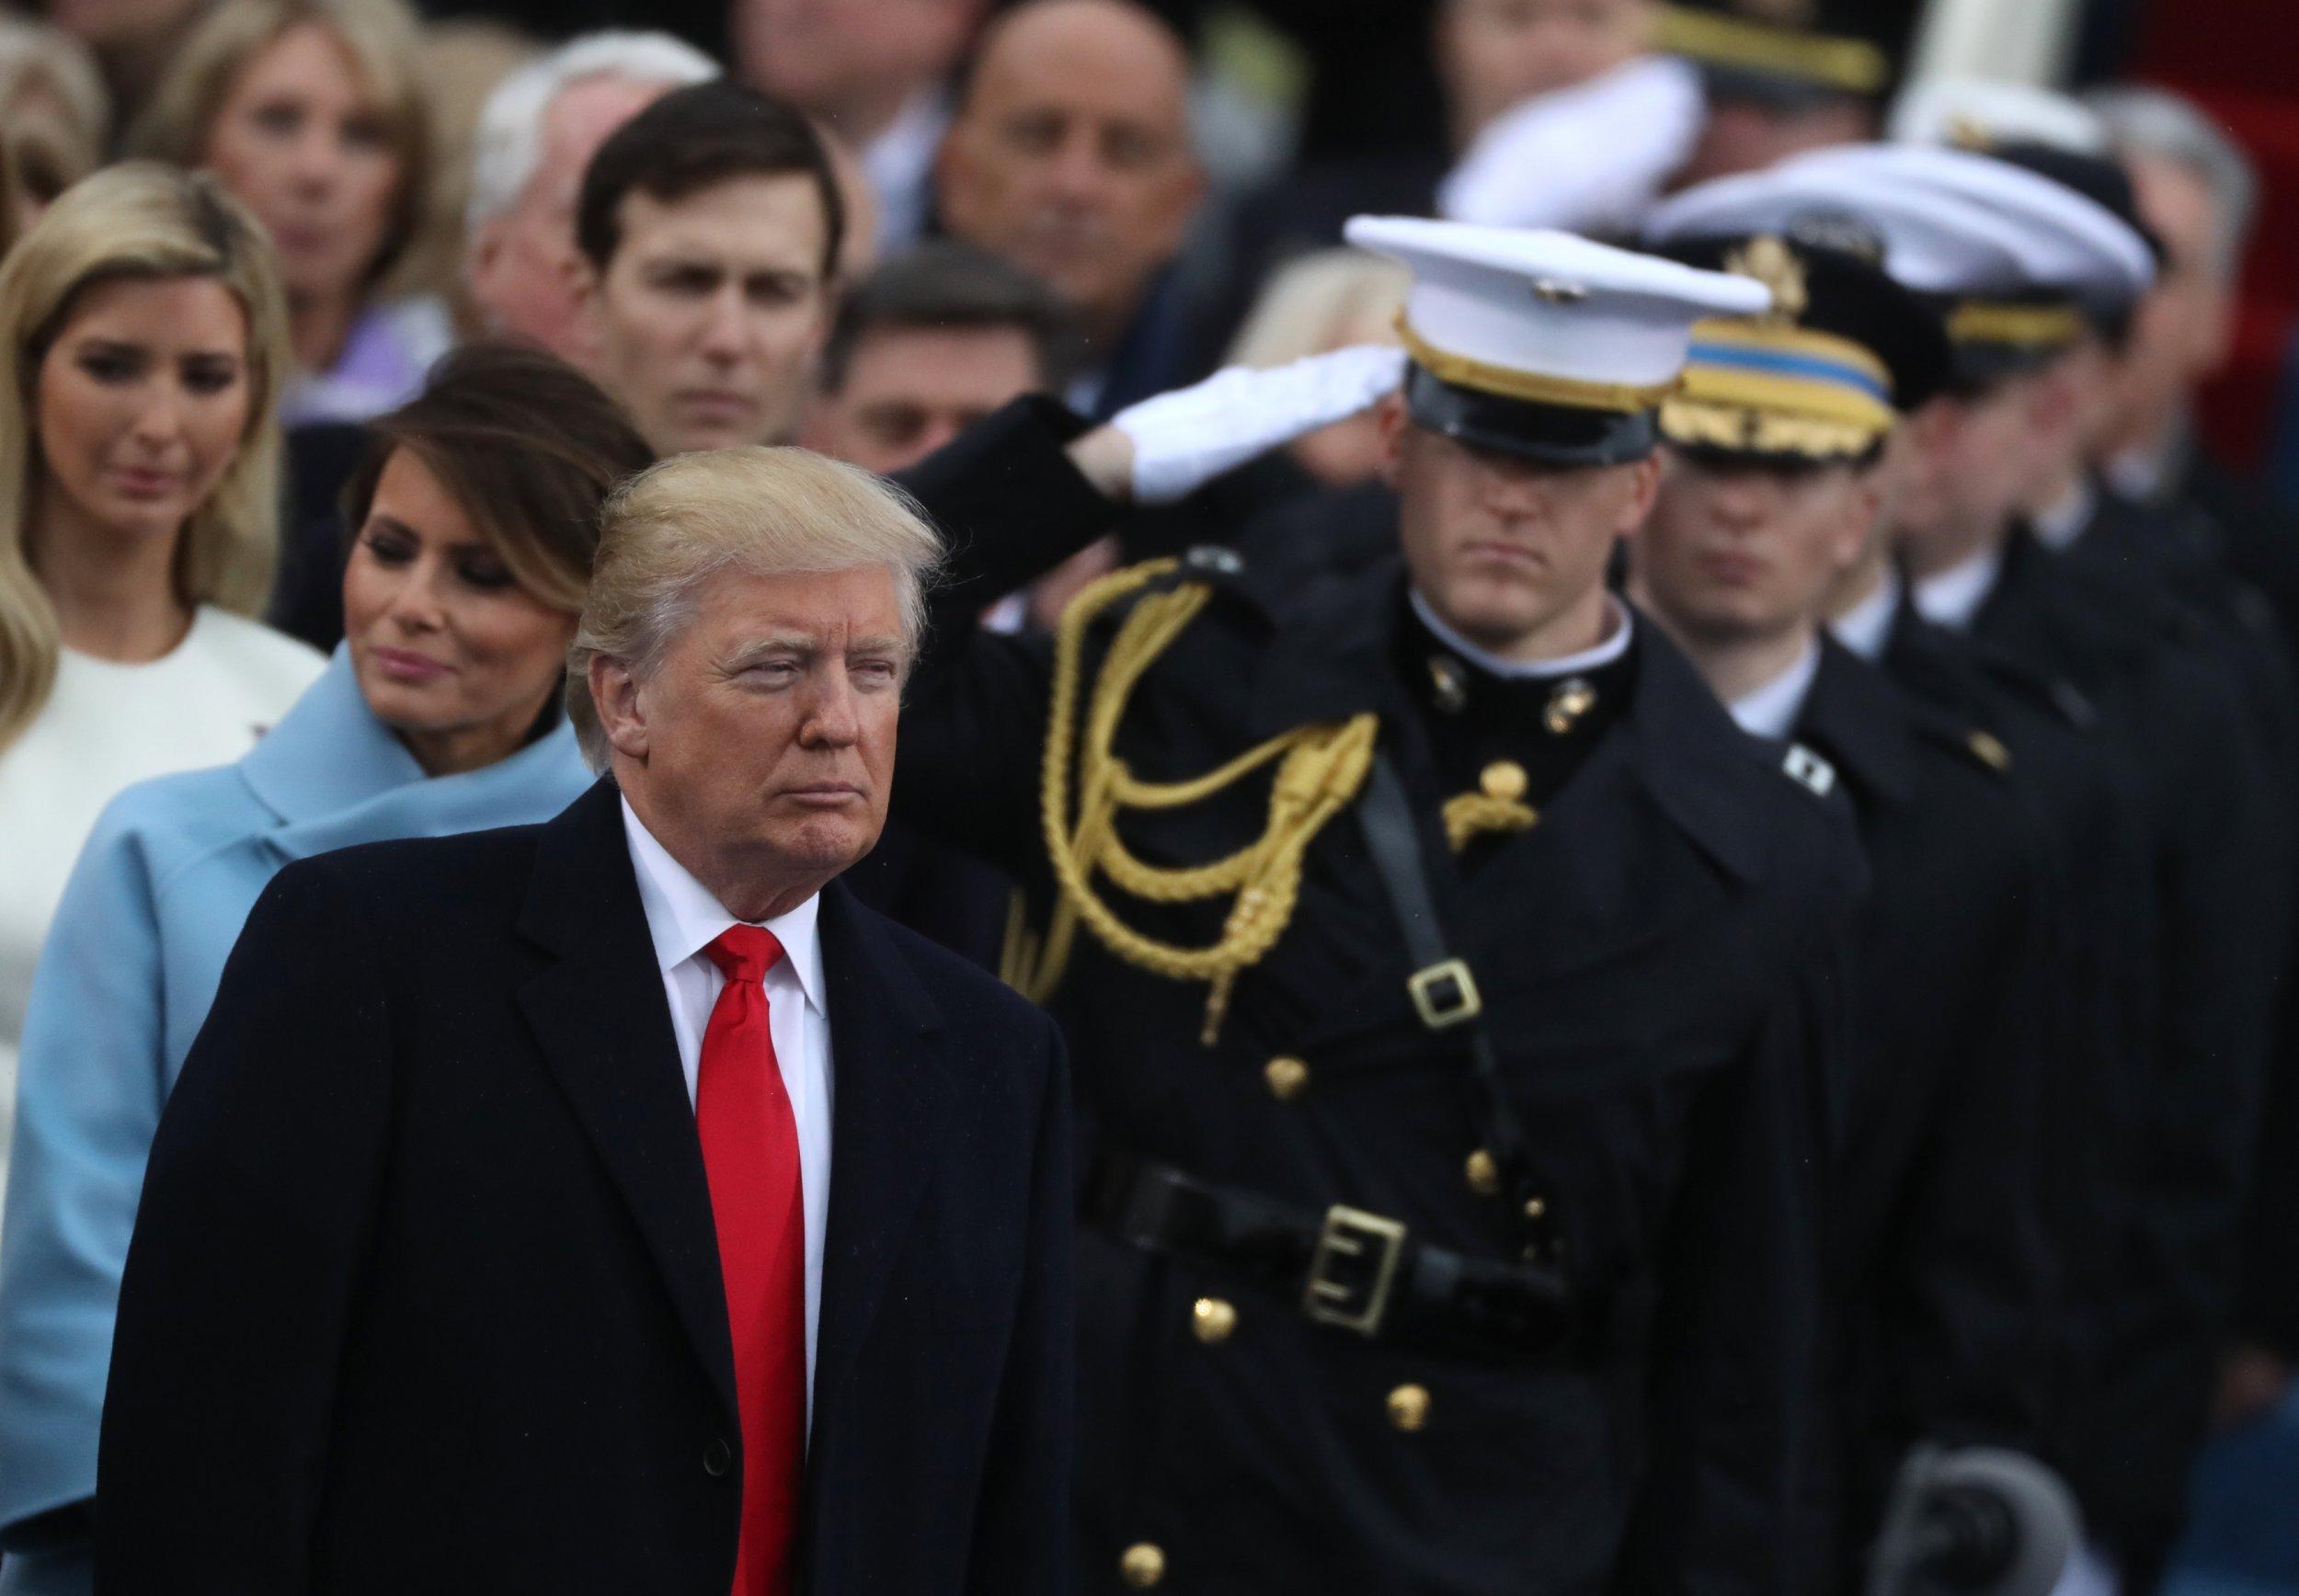 Trump military inauguration